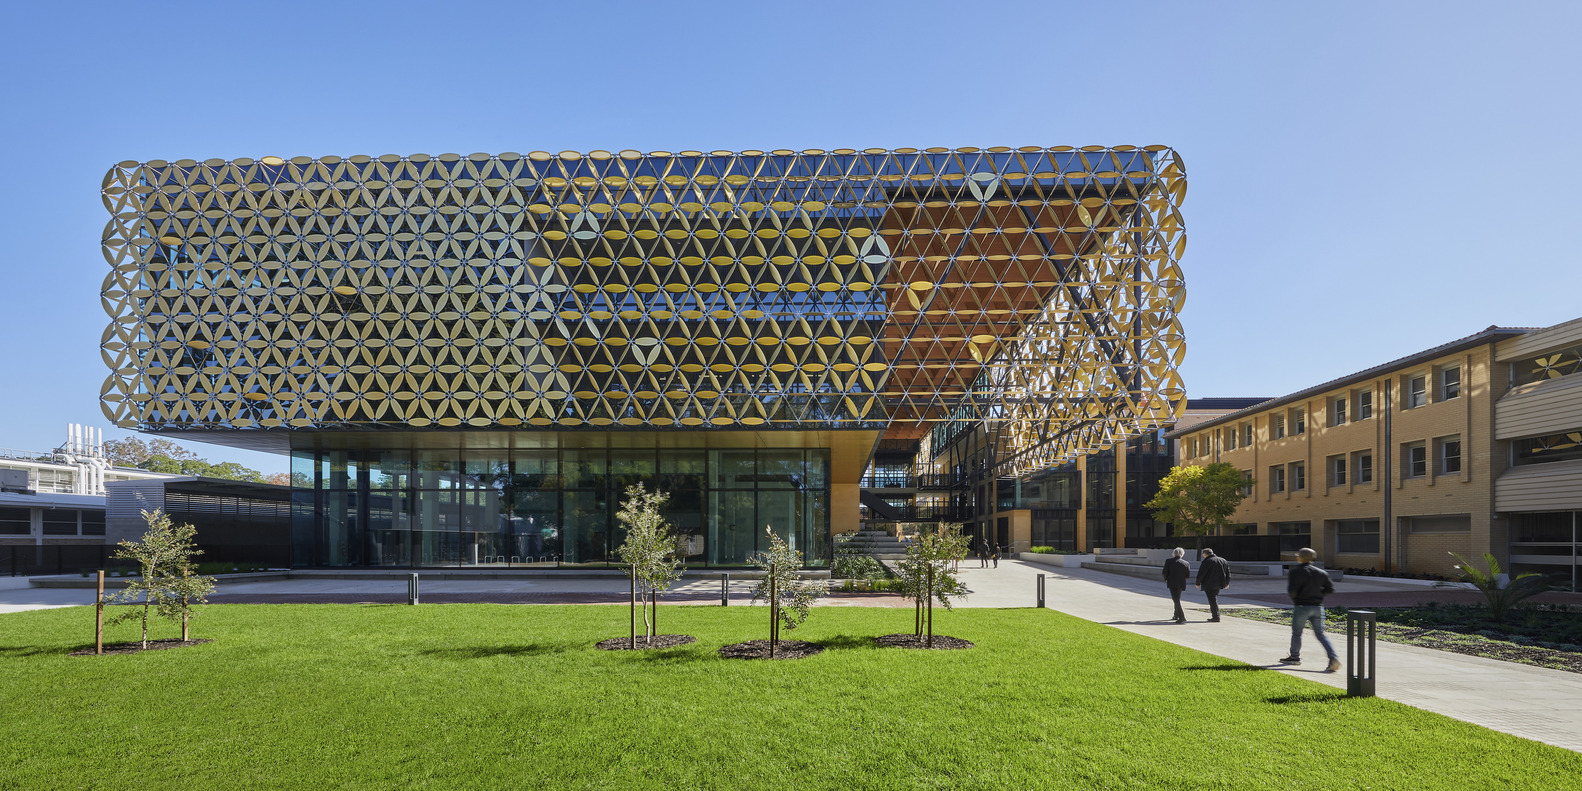 University of Western Australia EZONE / Hassell